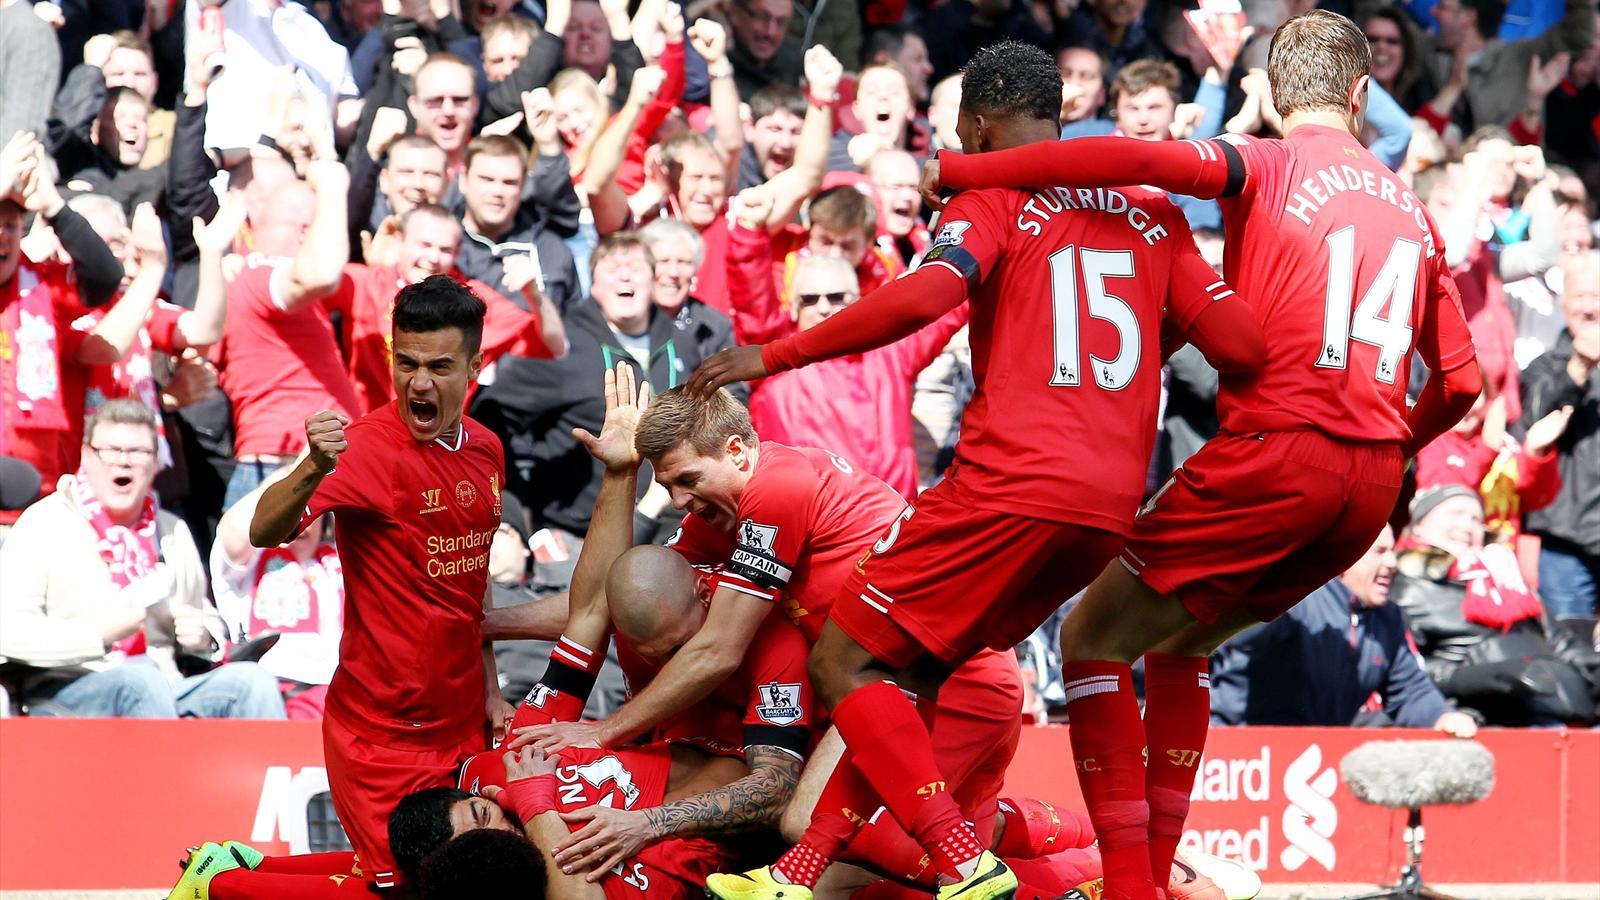 Liverpool players celebrating imago